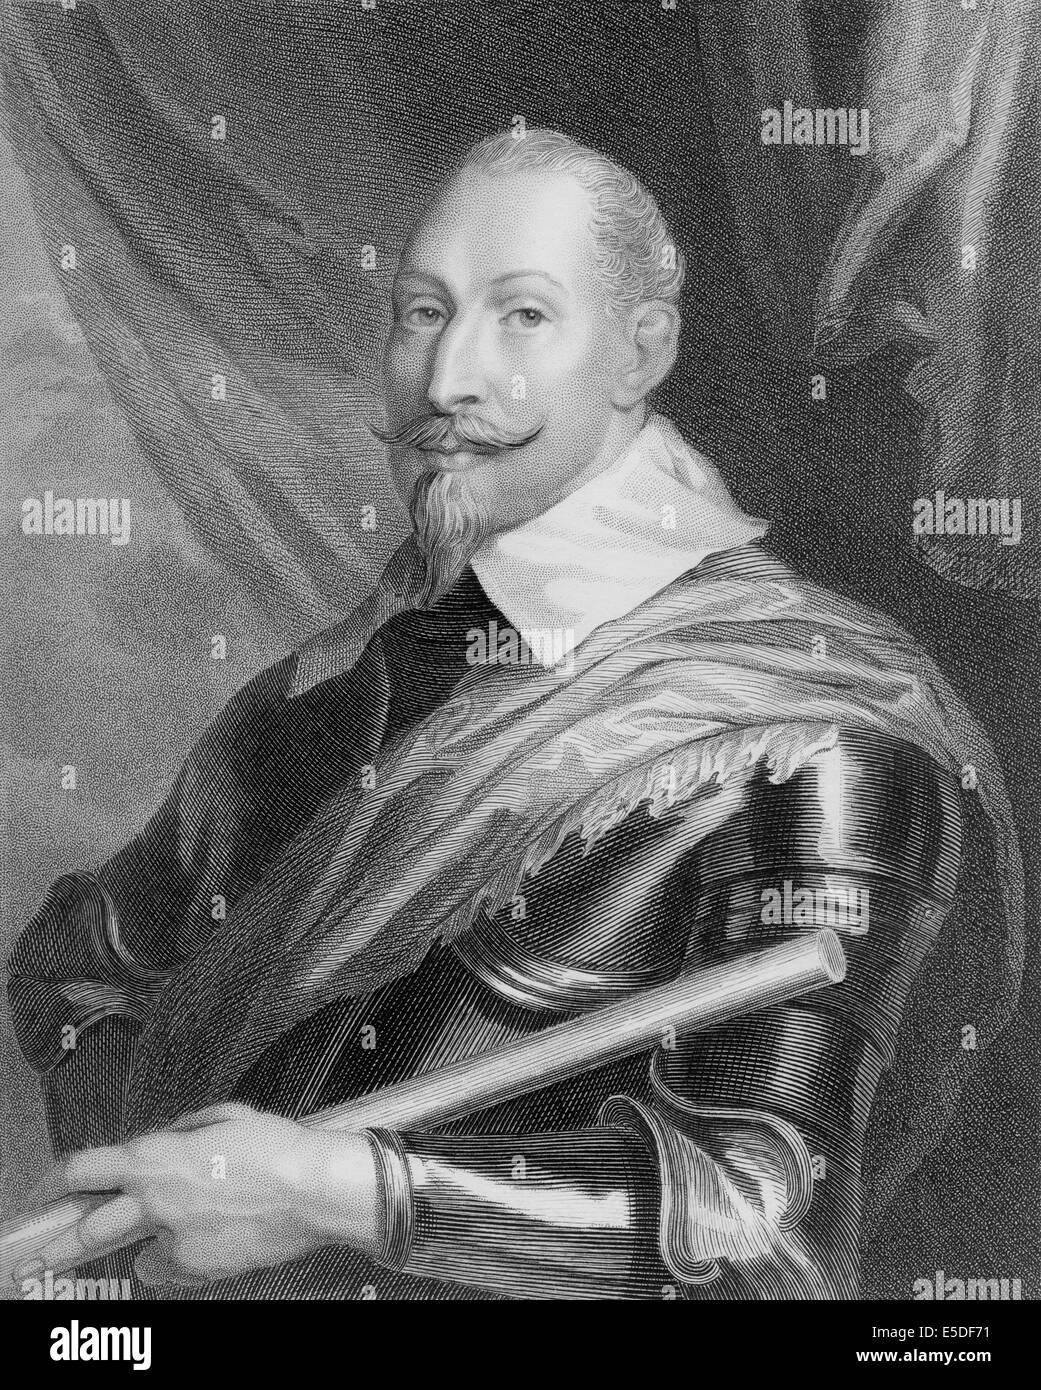 Steel engraving, c. 1860,  Gustav II Adolf, 1594 - 1632, King of Sweden from the ruling family of Vasa - Stock Image